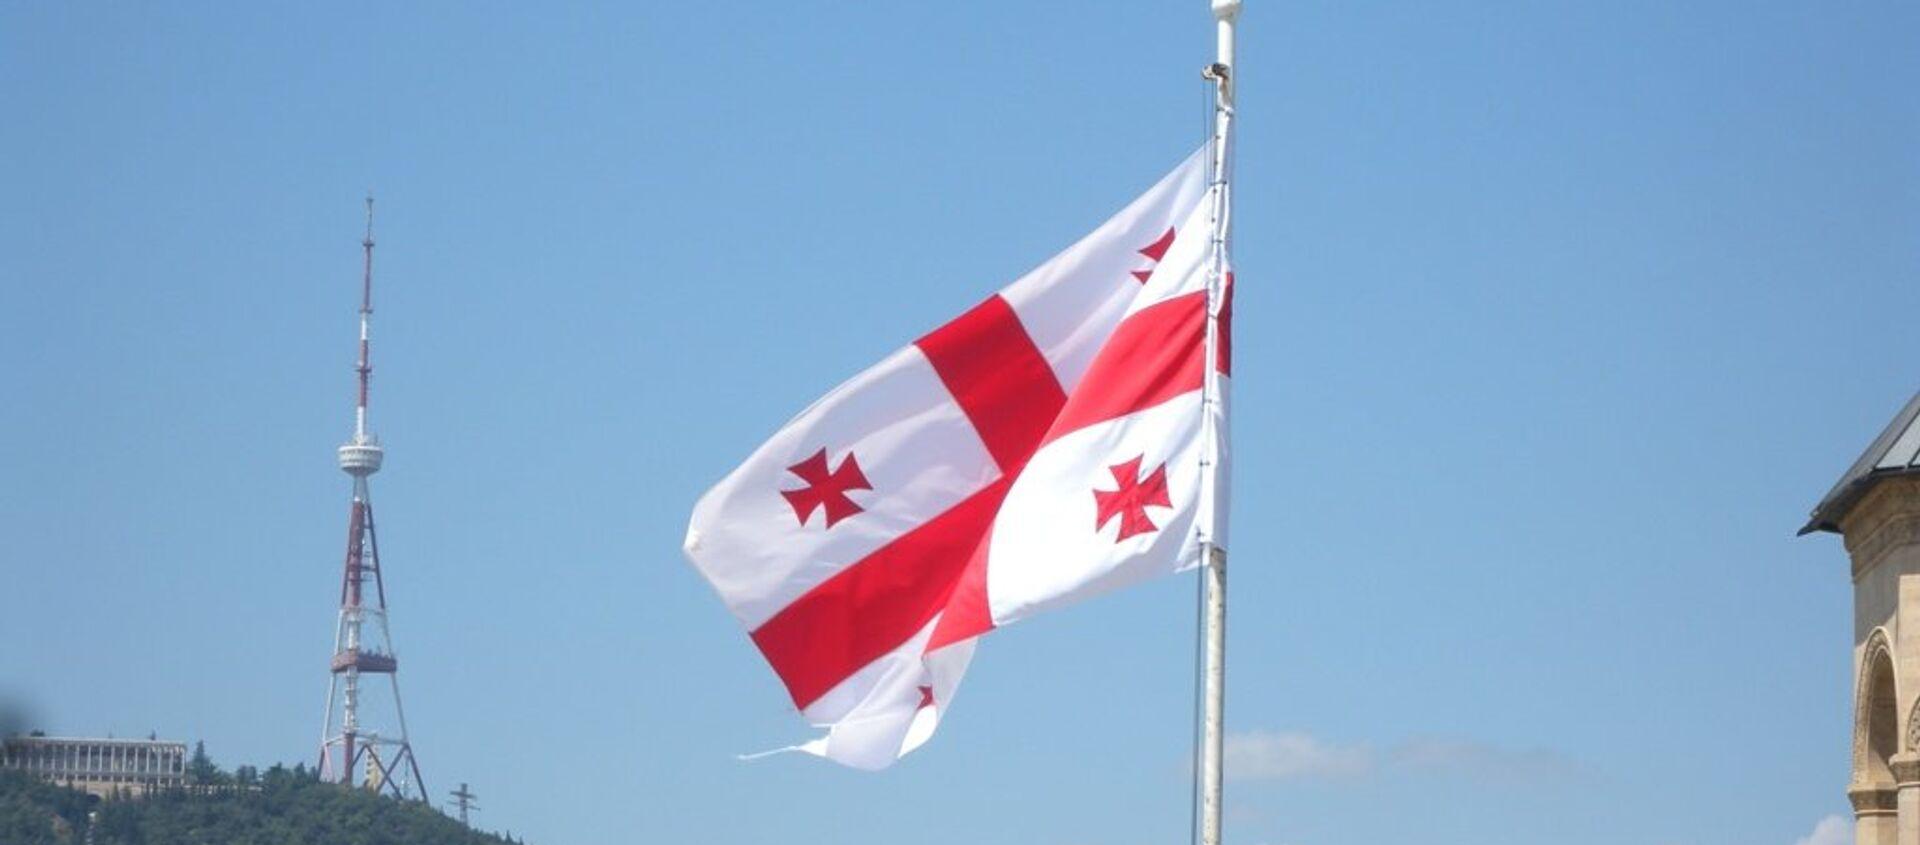 Грузия флаг - Sputnik Грузия, 1920, 17.03.2021